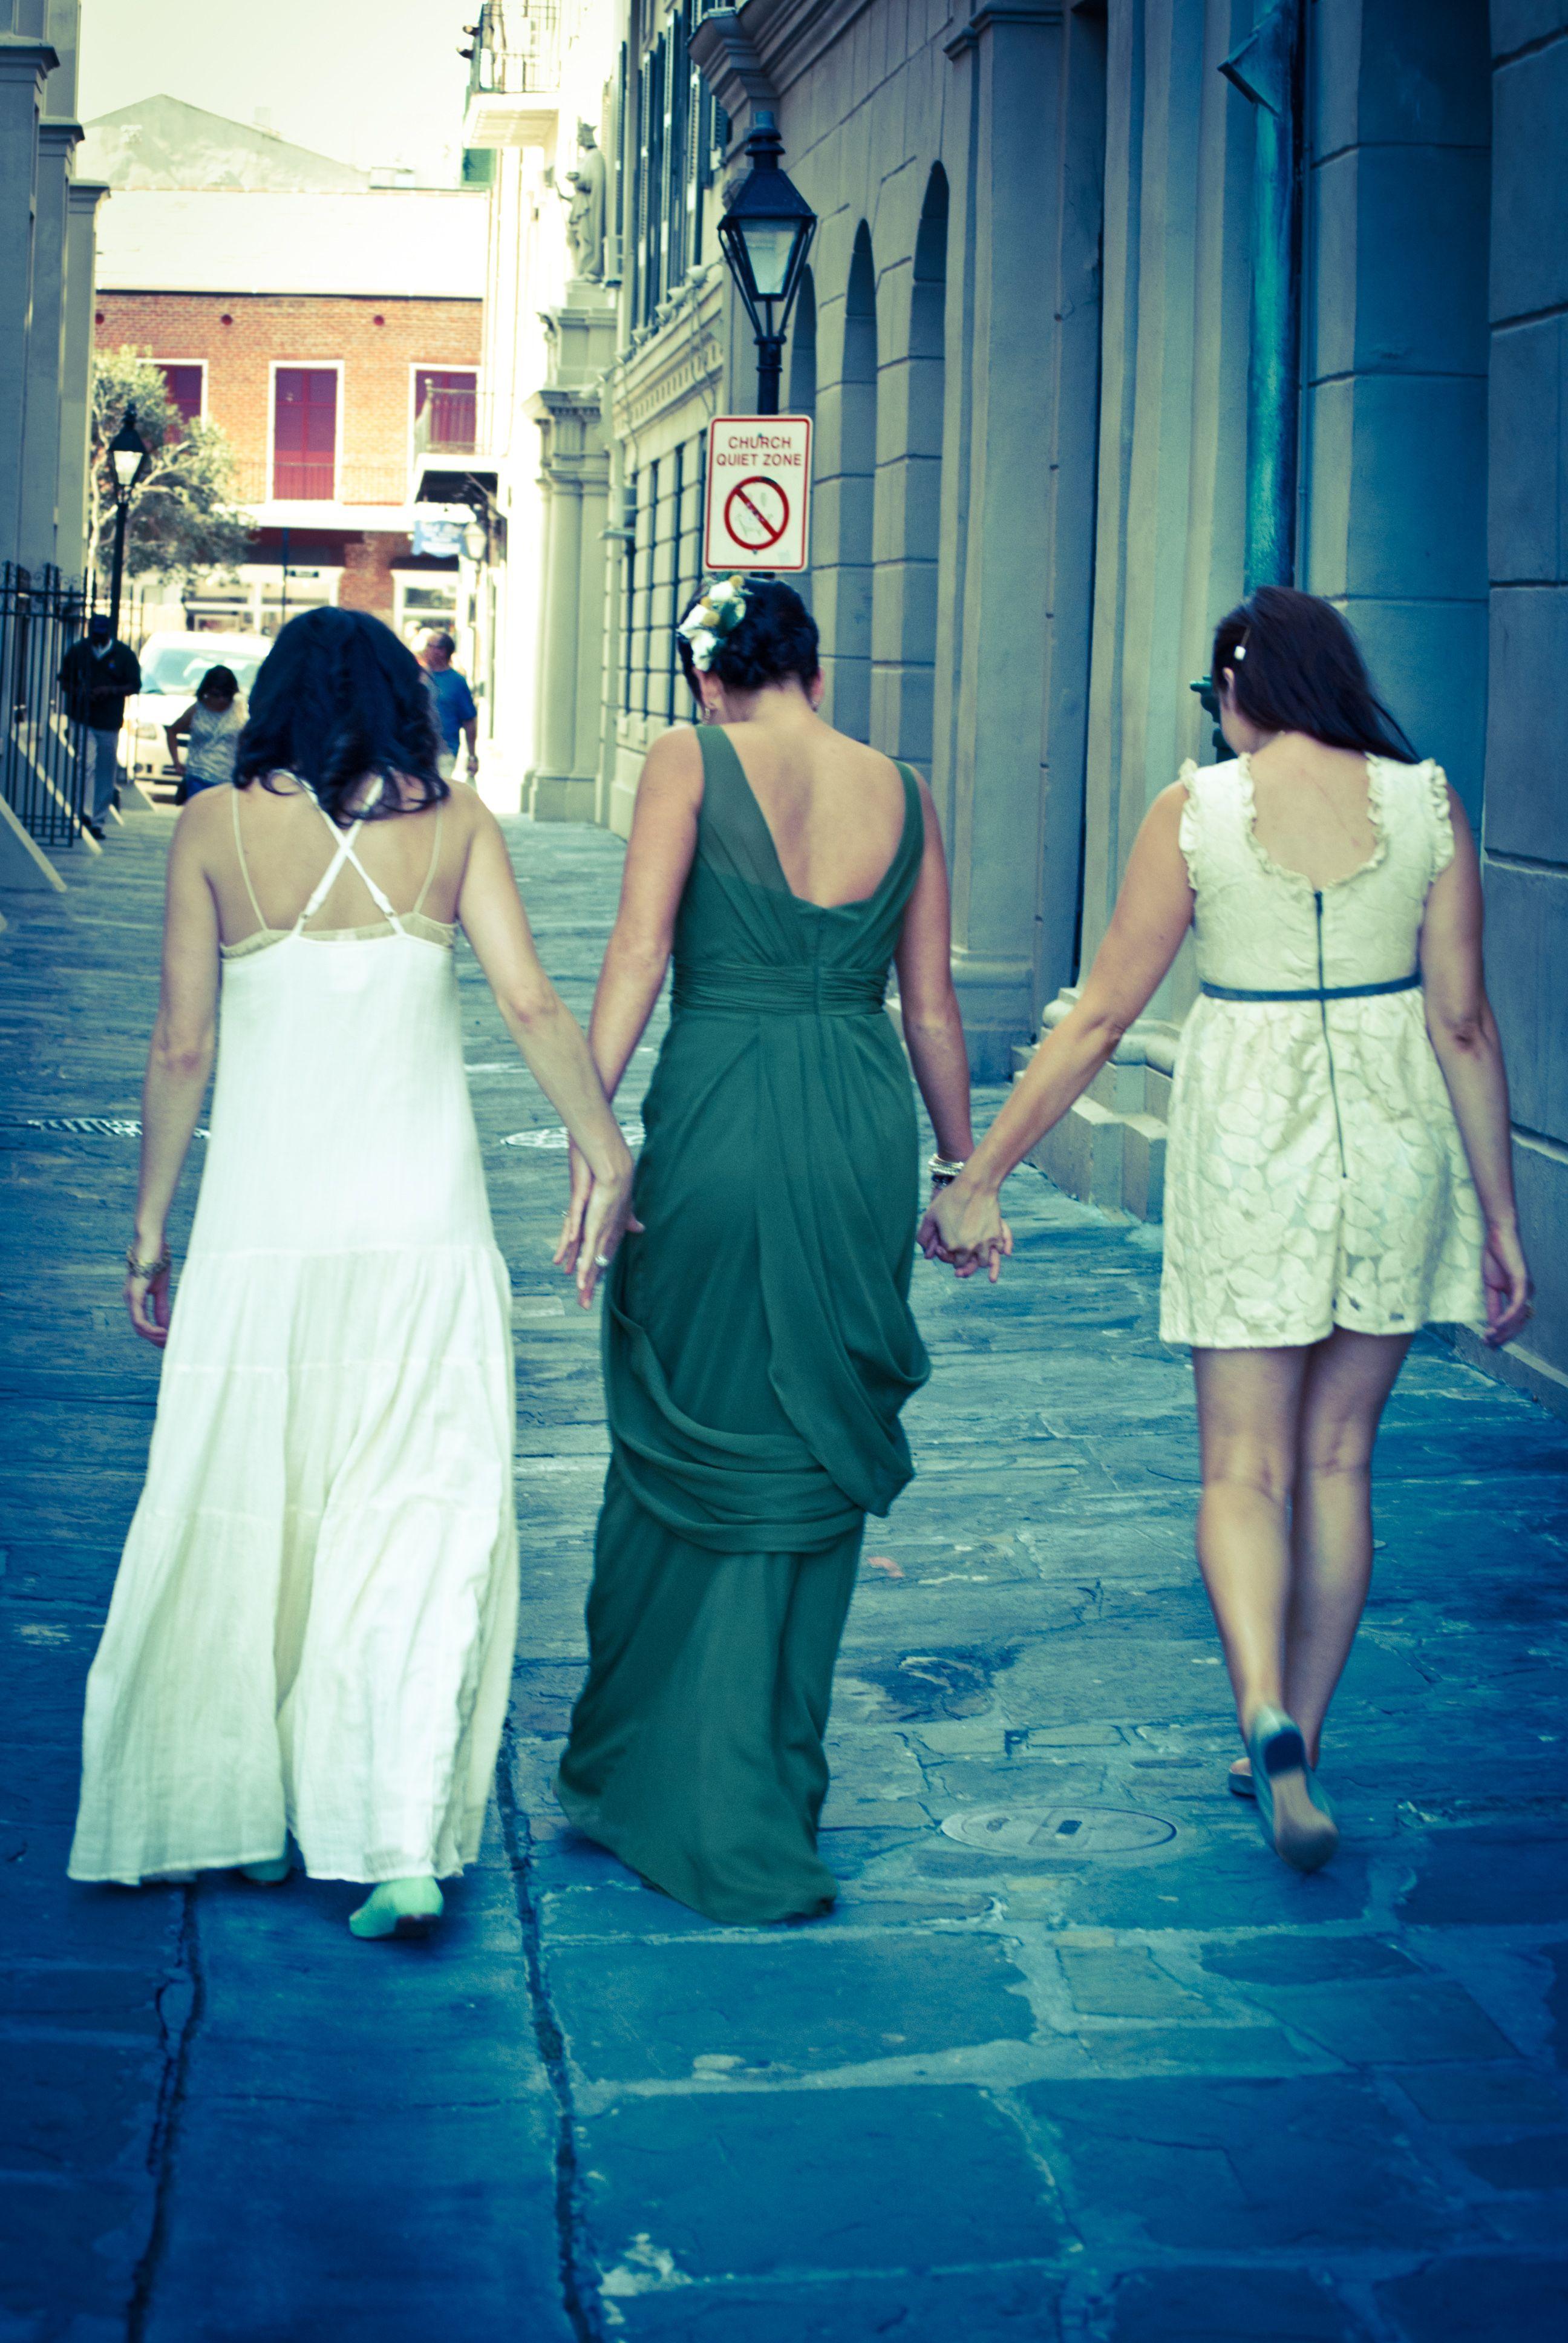 jackson square alley bride and bridesmaids